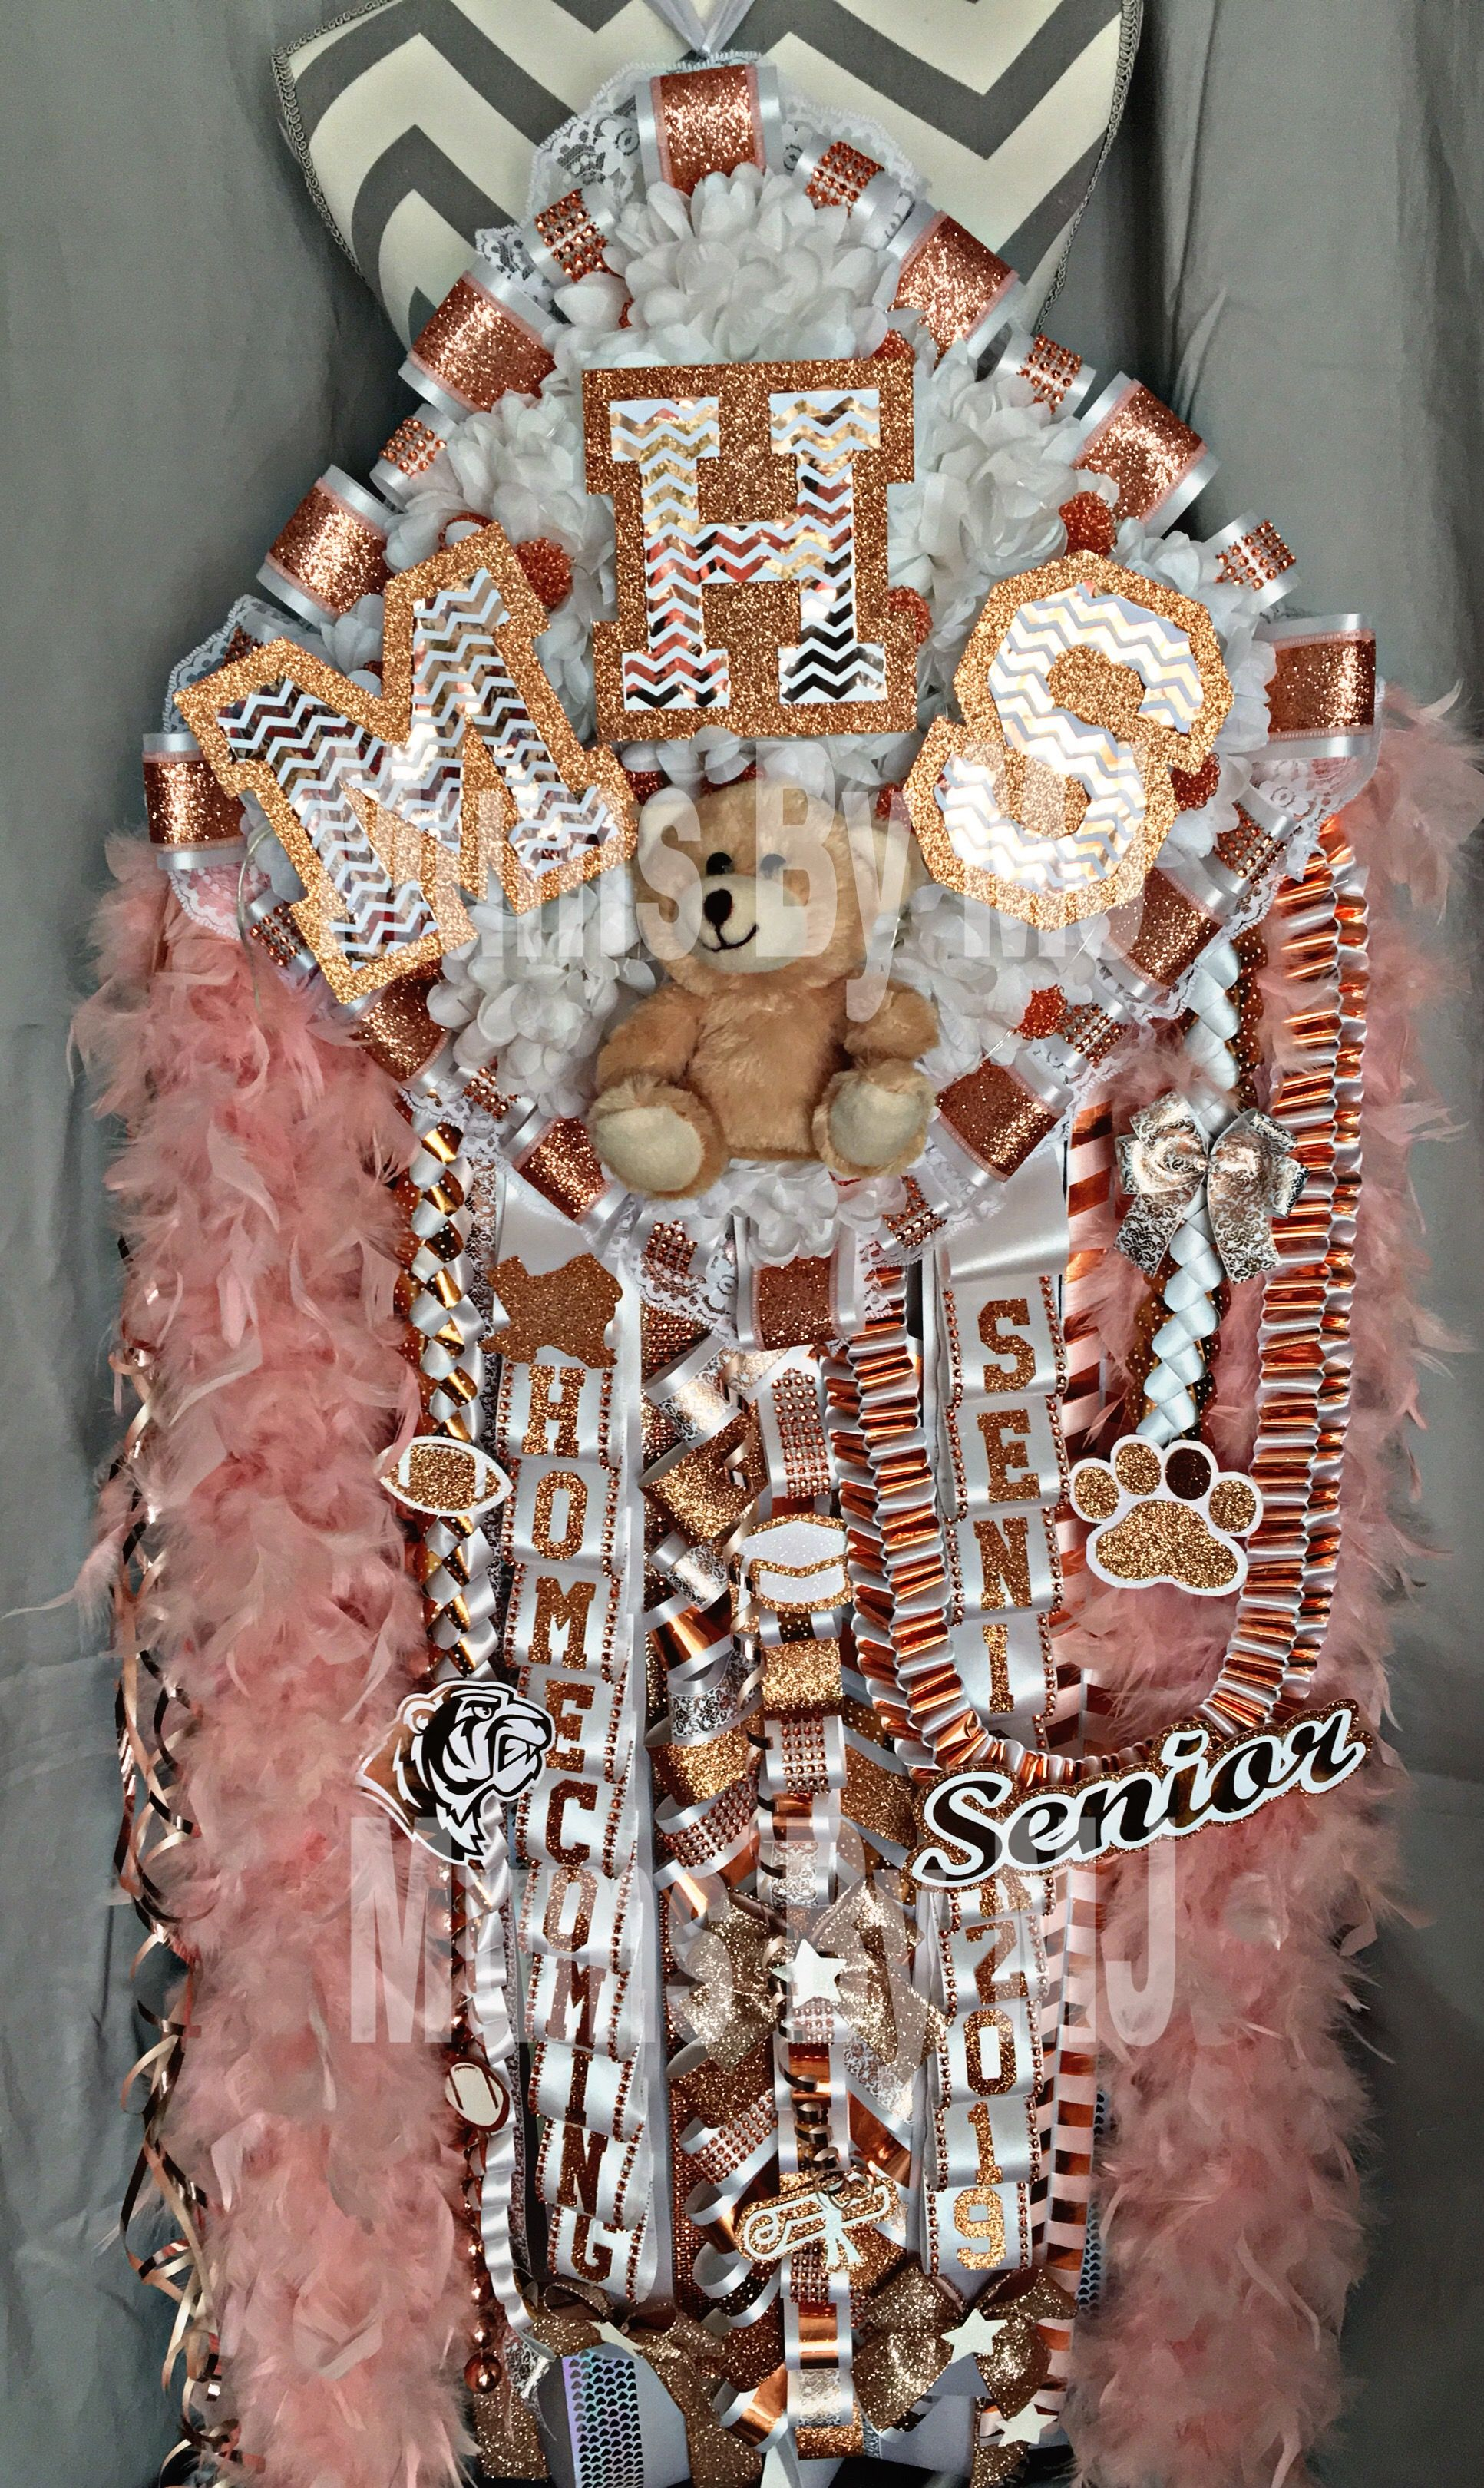 Rose Gold / Copper themed homecoming Mum! Mega-Diamond Mum from Mums By MJ www.facebook.com/mumsbymj Find us on instagram: @mumsbymj #homecomingmumsdiy